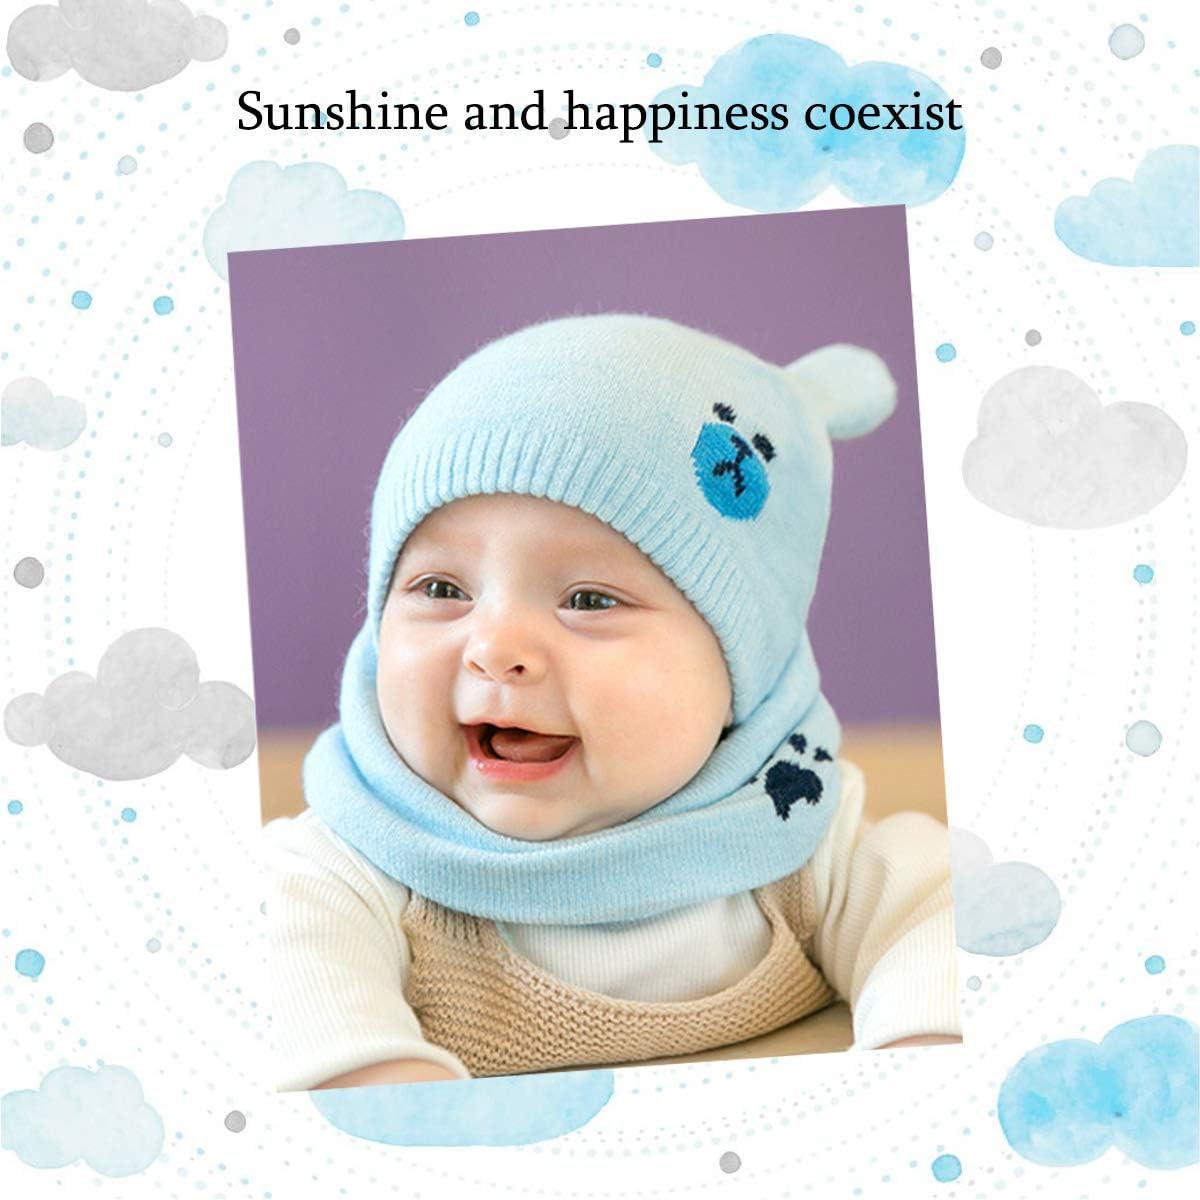 Blue ZONSUS ADESUGATA Baby Boy Girl Cute Baby Winter Hats Scarfs Set,Toddler Children Warm Beanie Hat Knit Soft Cotton Caps Scarves for Infant Kids 0-36Months